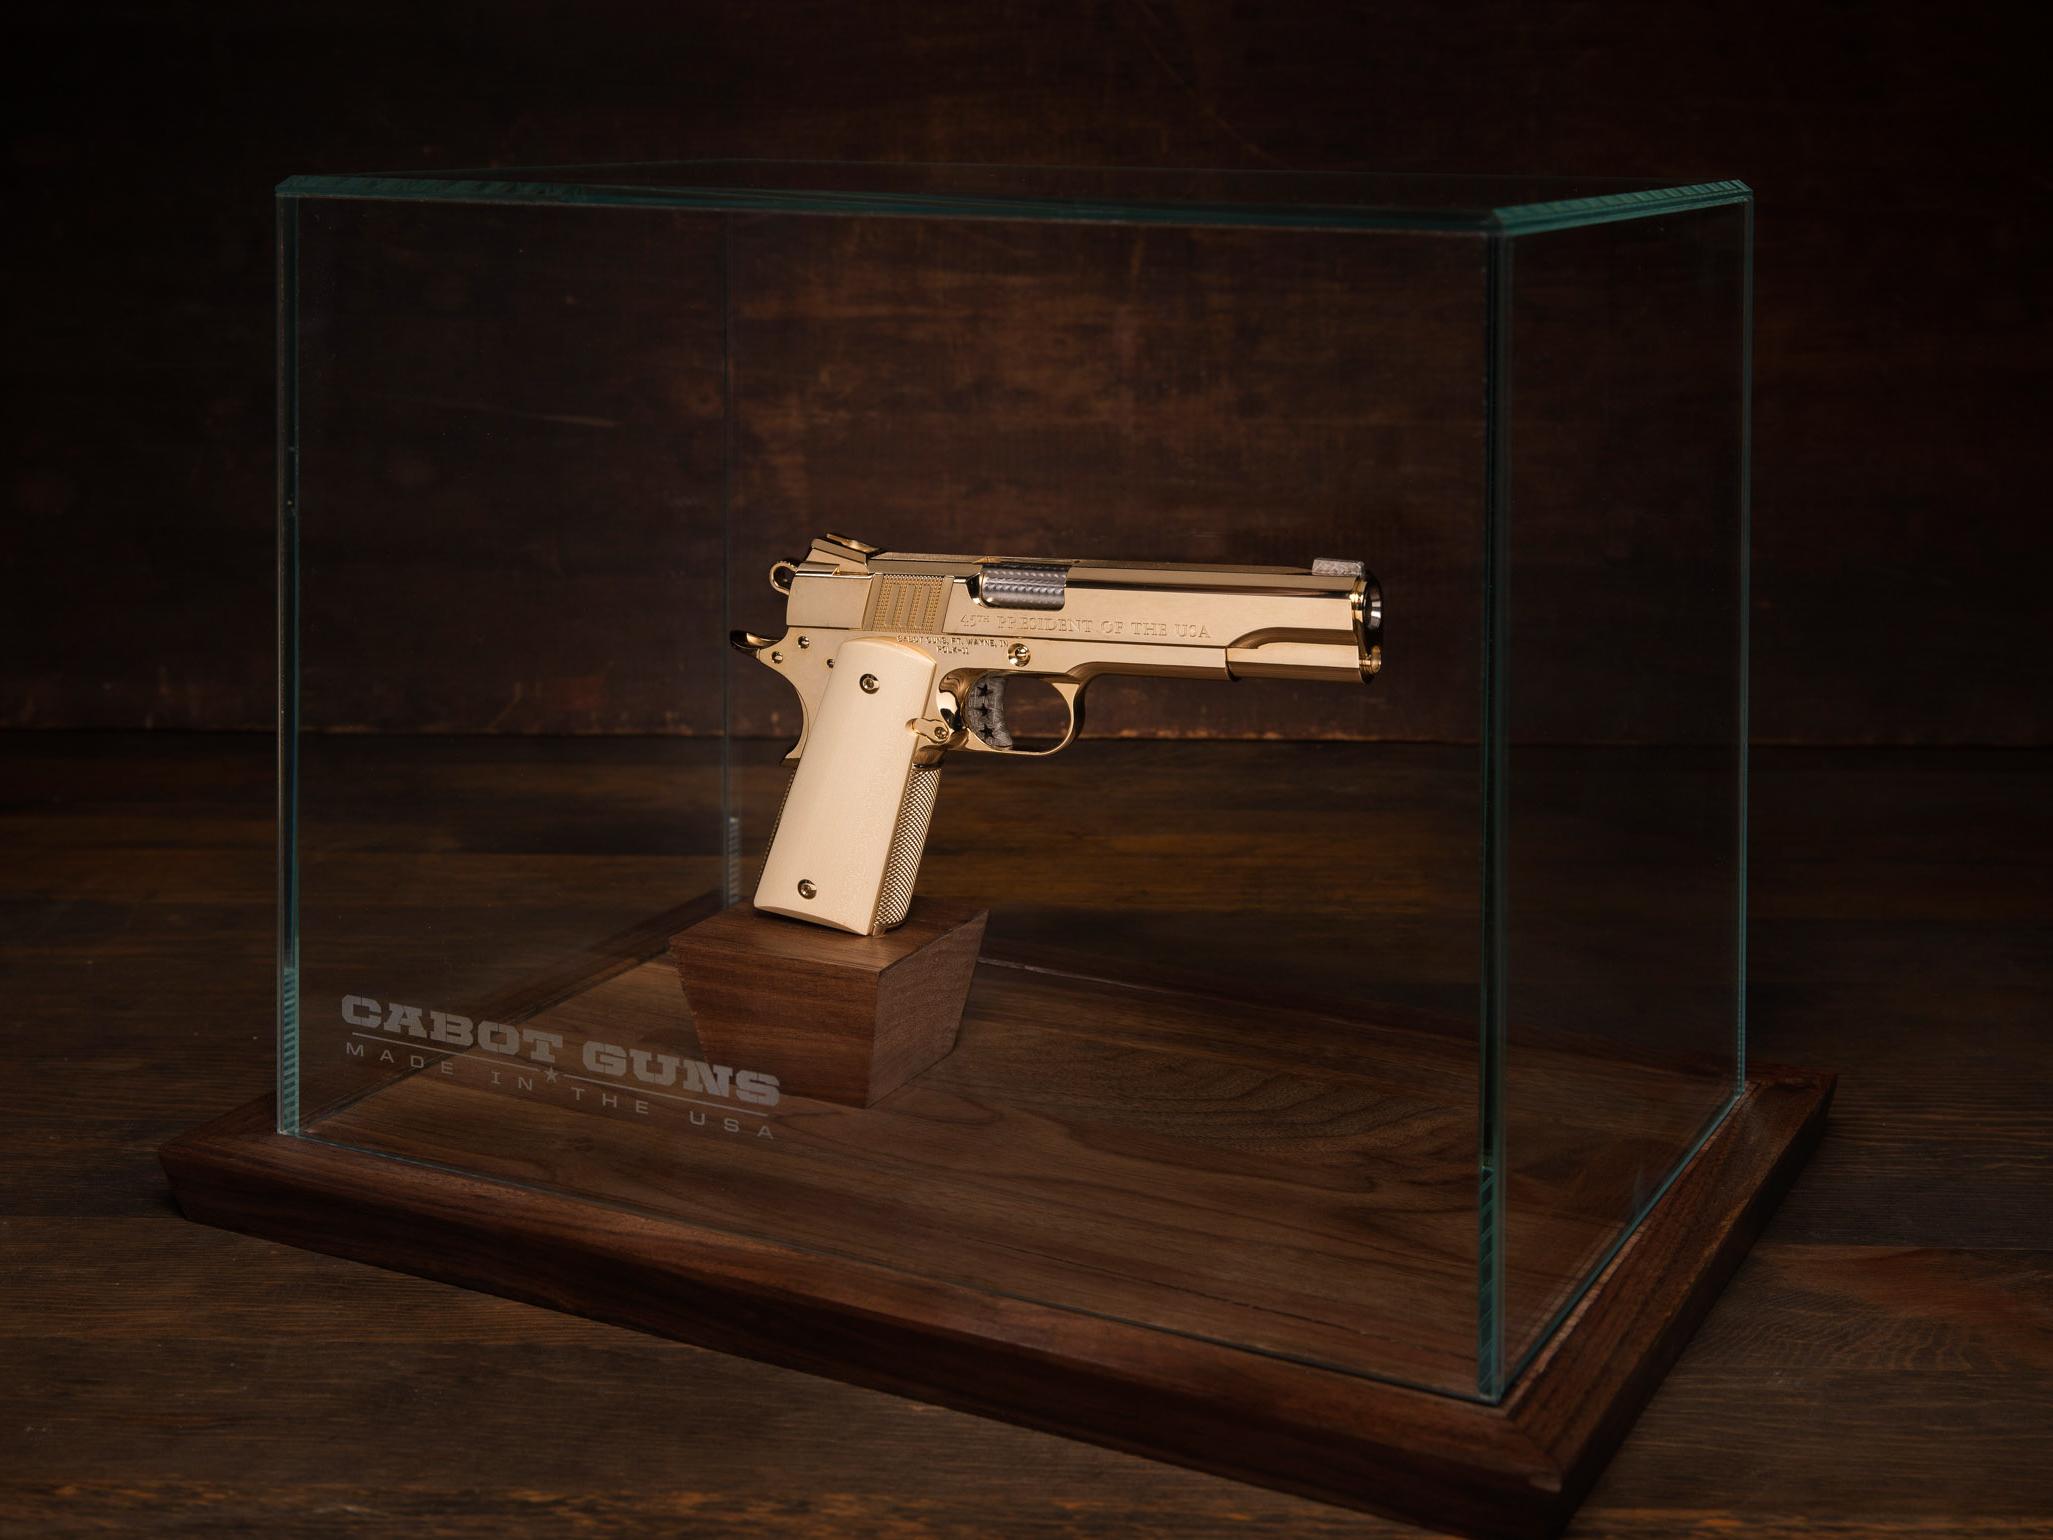 Trump 45 Pistol